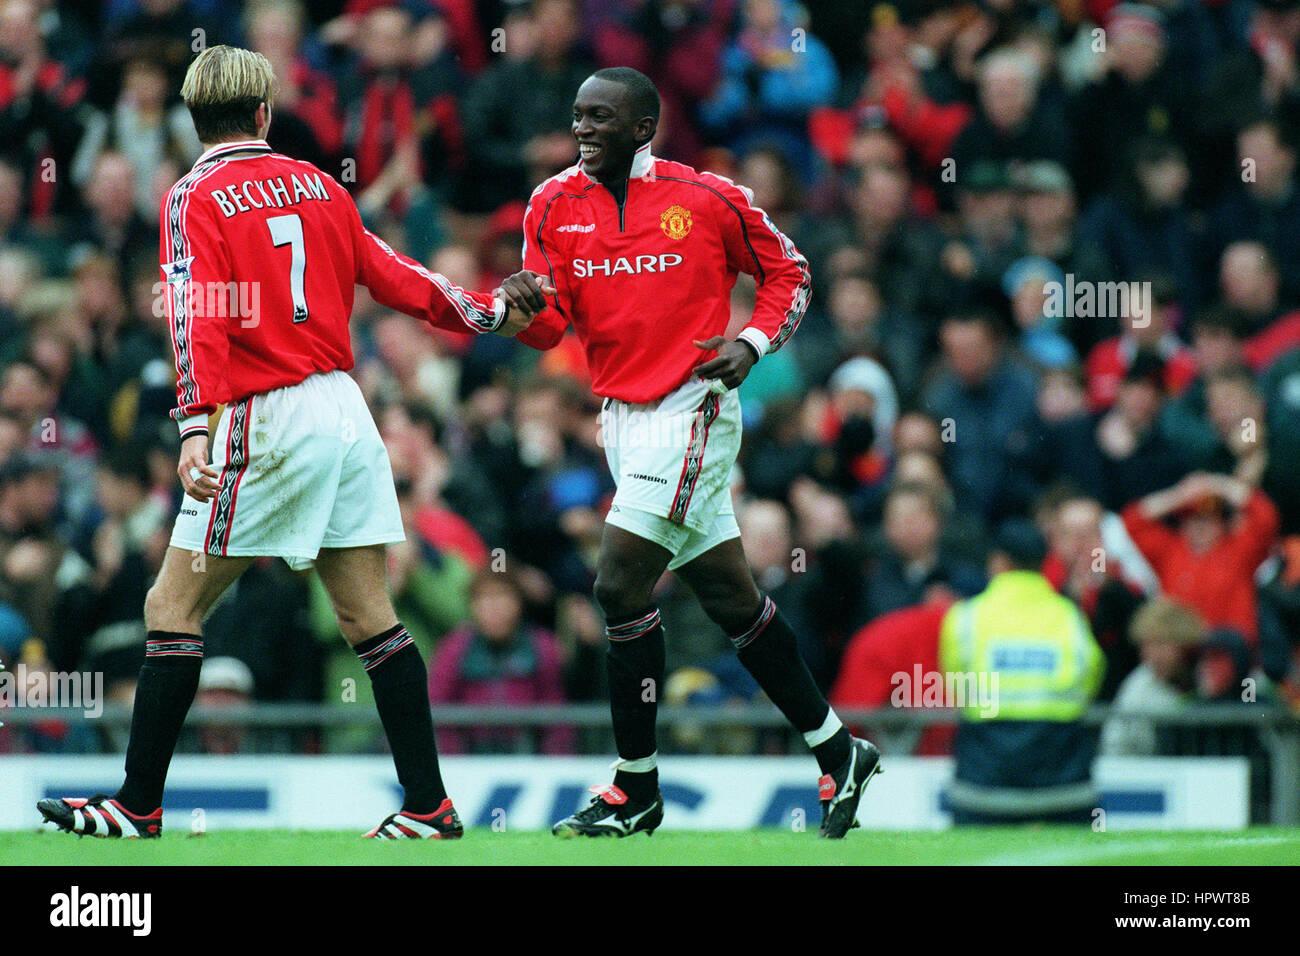 ee7c1dedb DAVID BECKHAM   DWIGHT YORKE MANCHESTER UNITED FC 18 October 1998 - Stock  Image